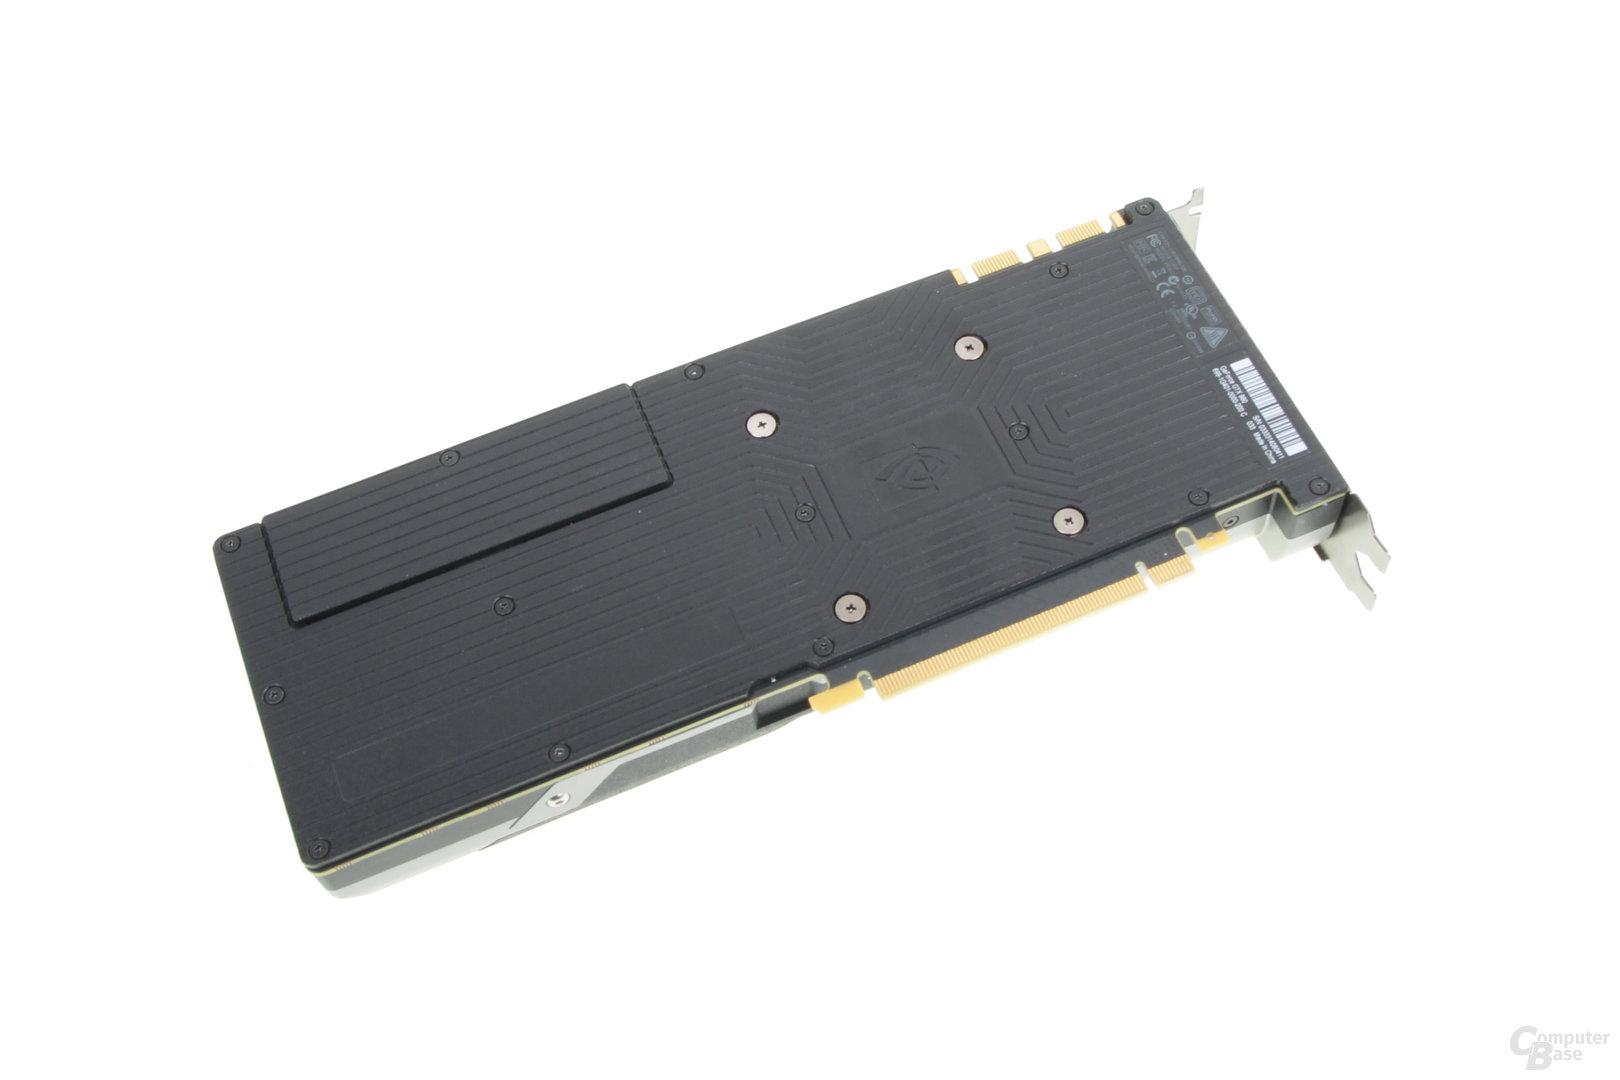 Nvidia GeForce GTX 980 – Rückseite